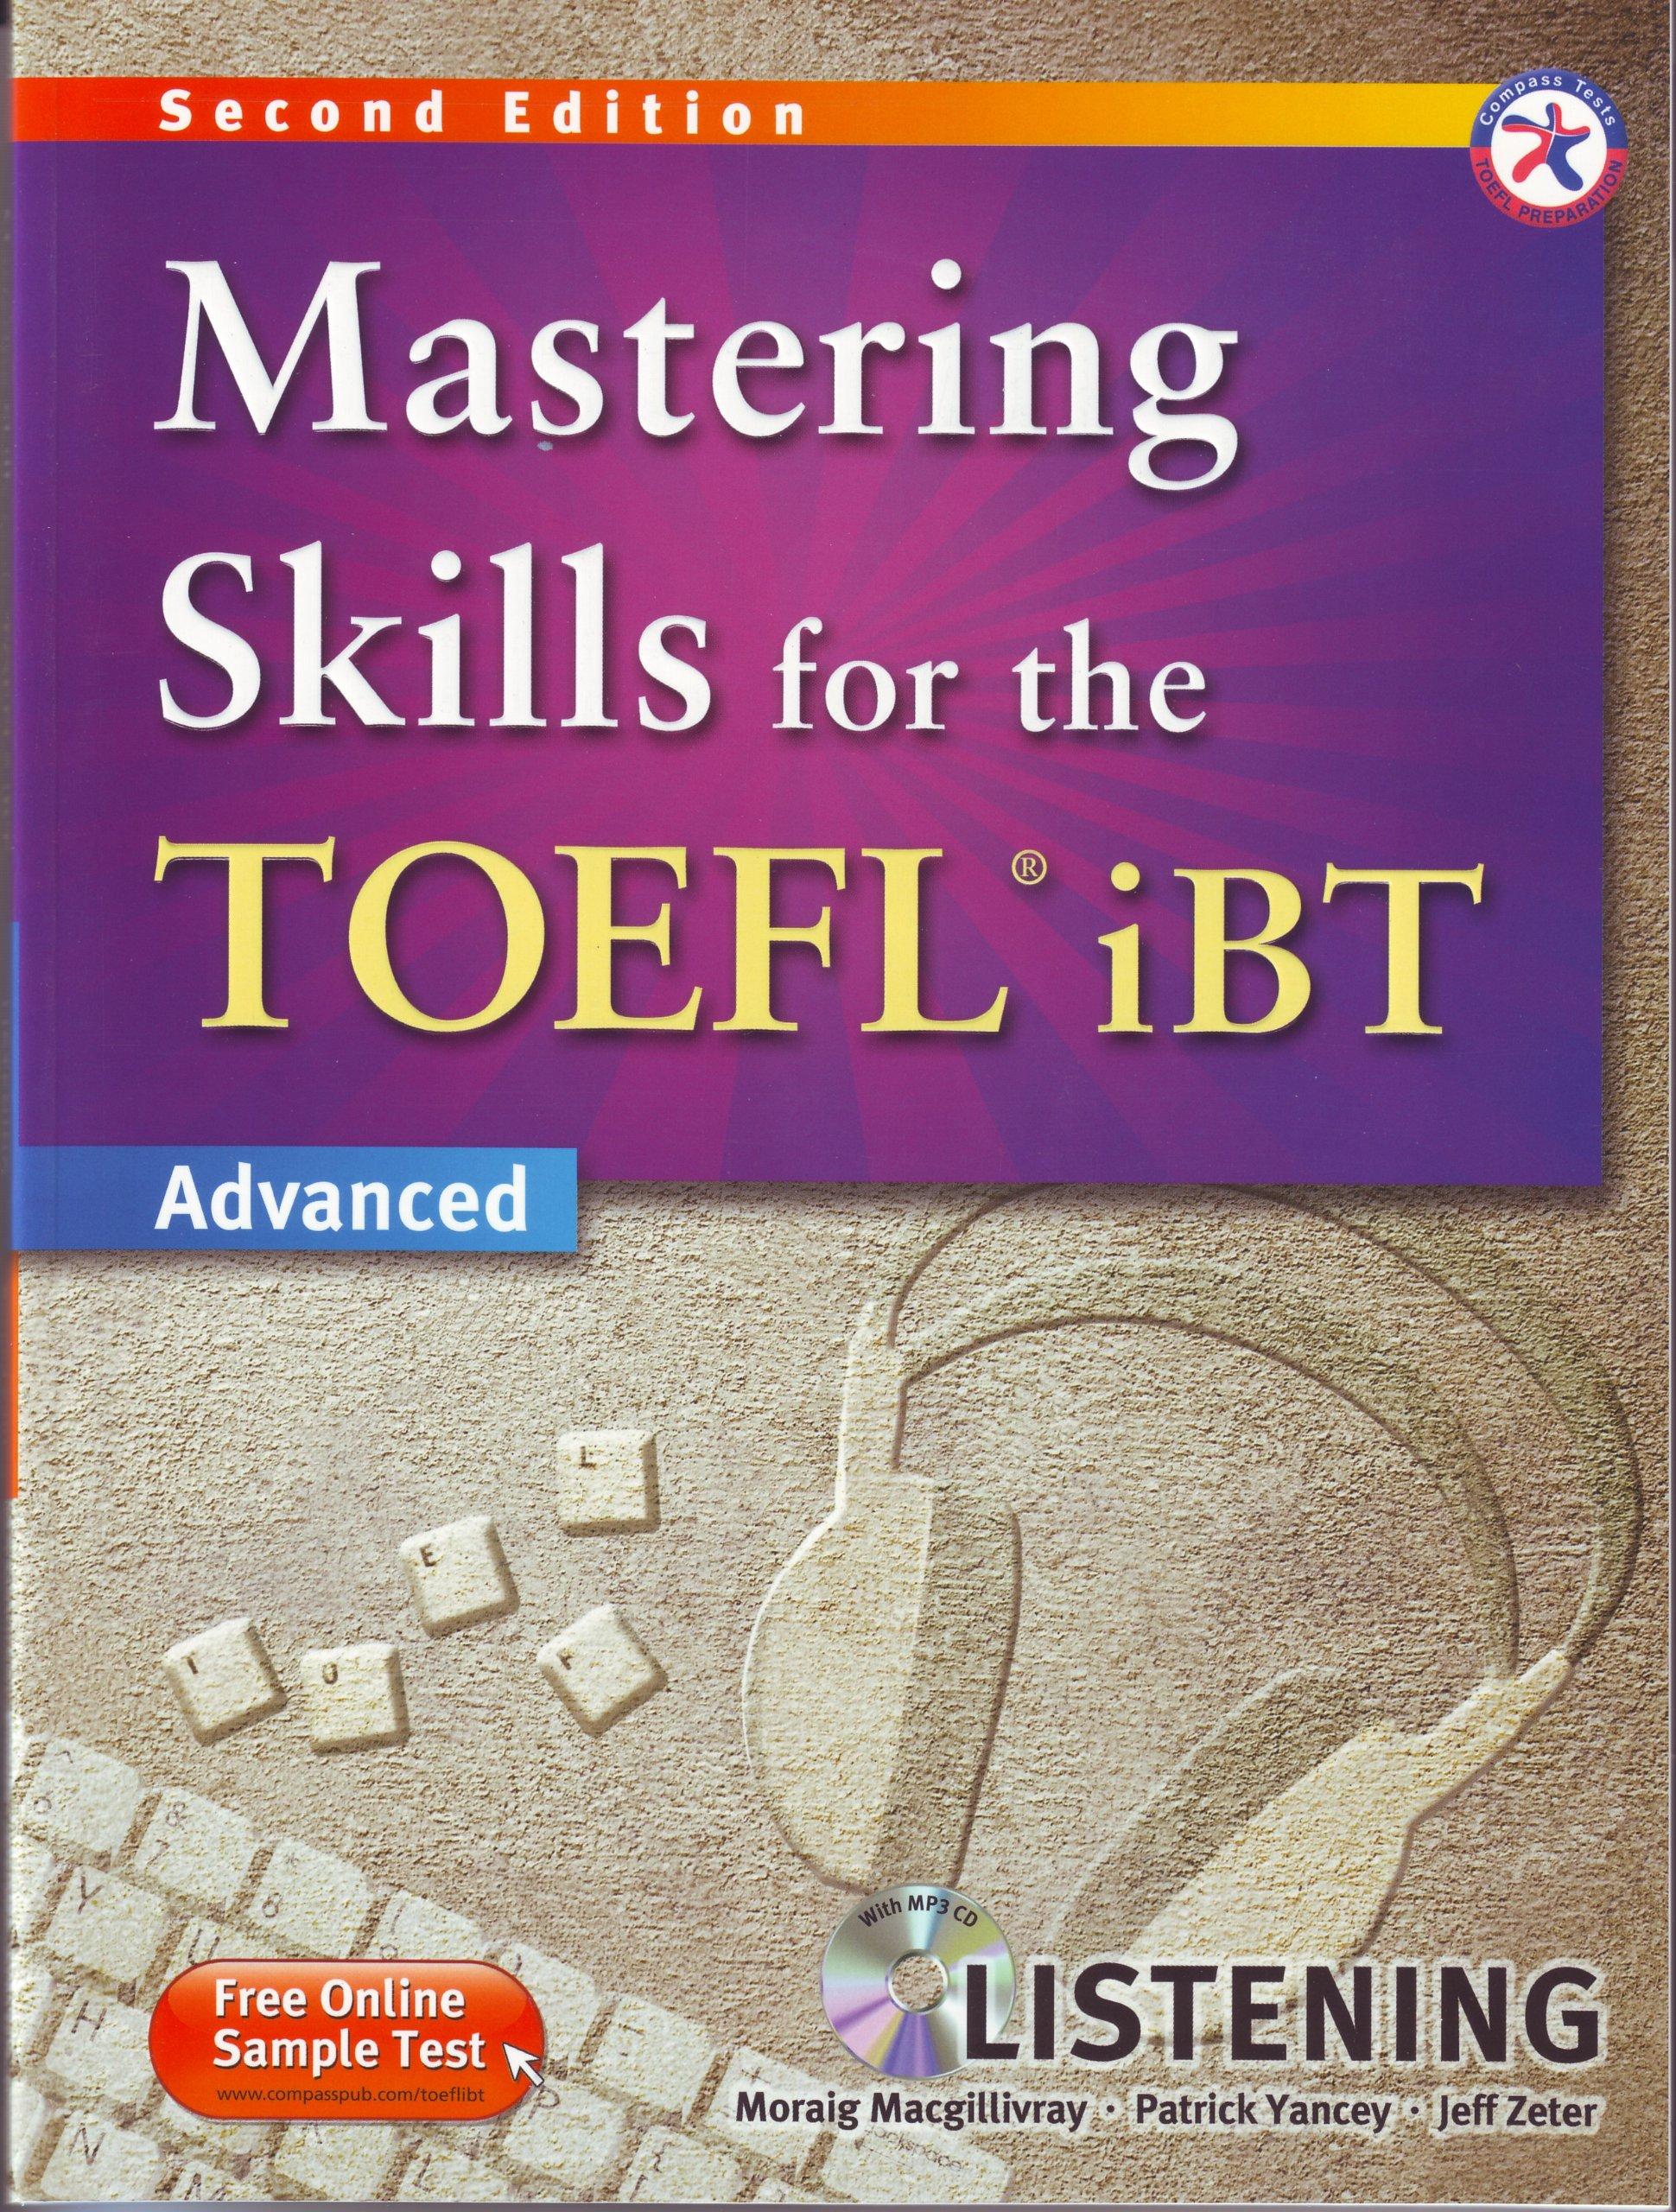 Toefl listening | toefl ibt lecture test 30-3 – toefl ibt listening.